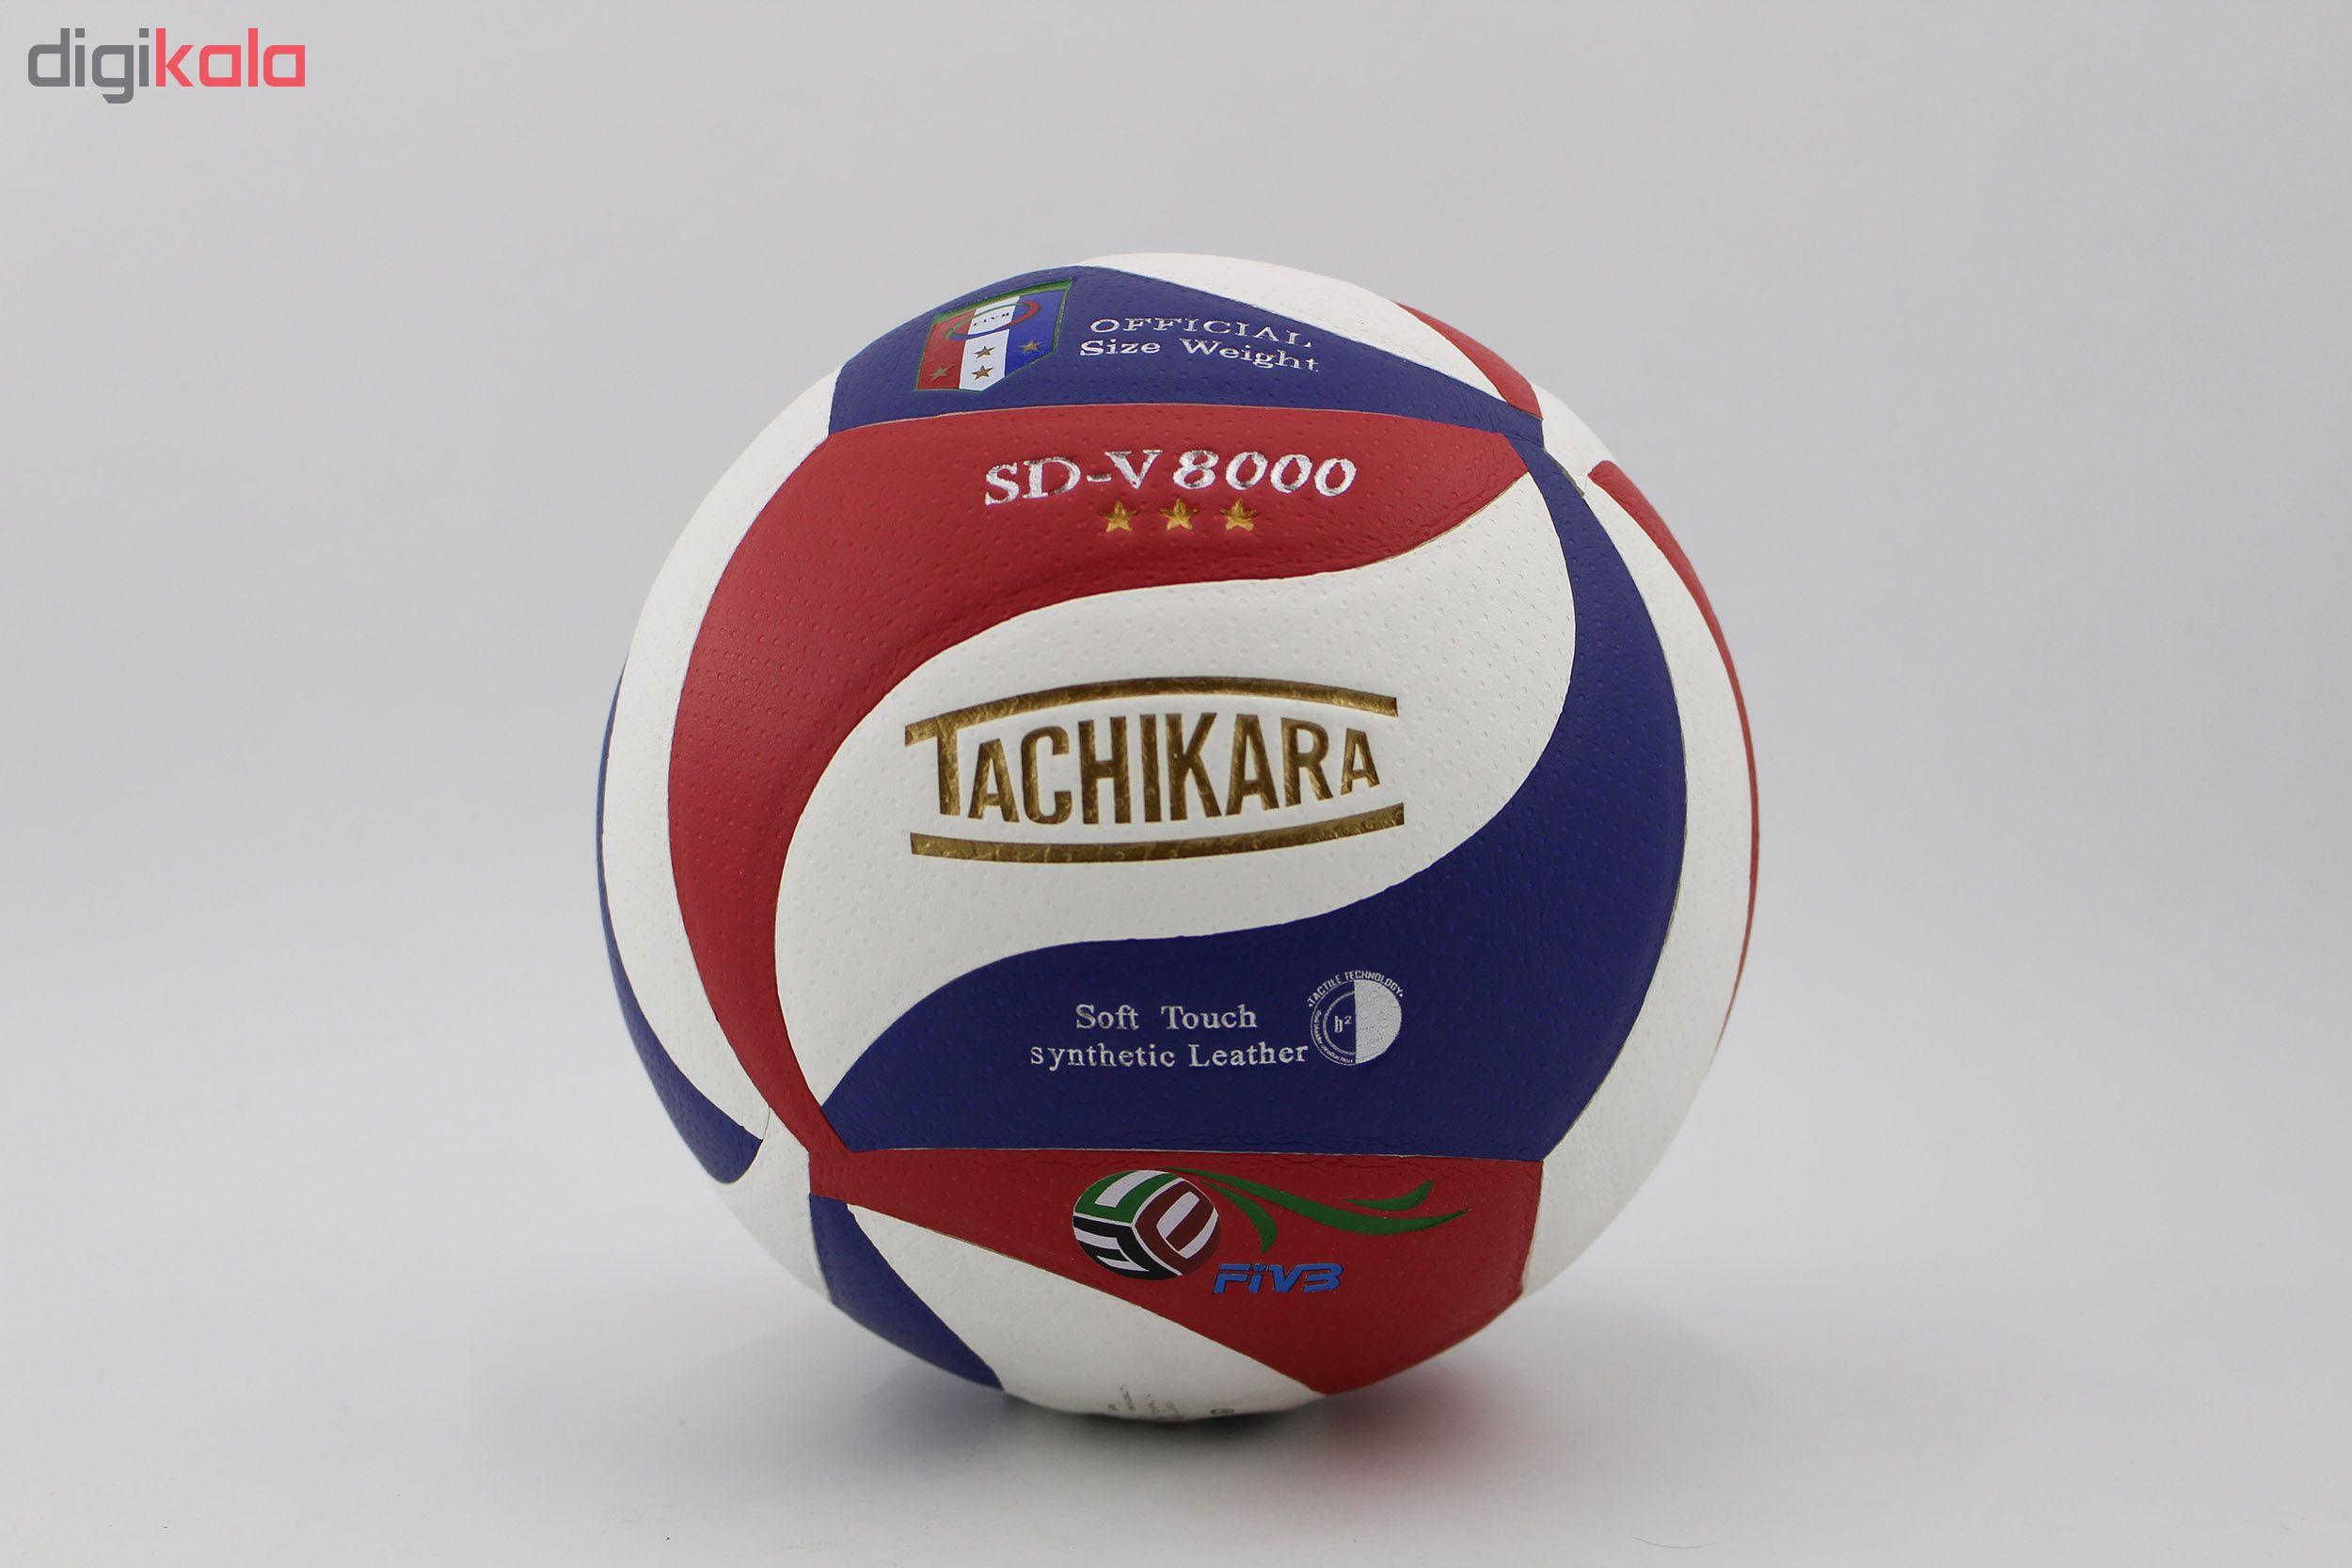 توپ والیبال تاچیکارا مدل SDV800